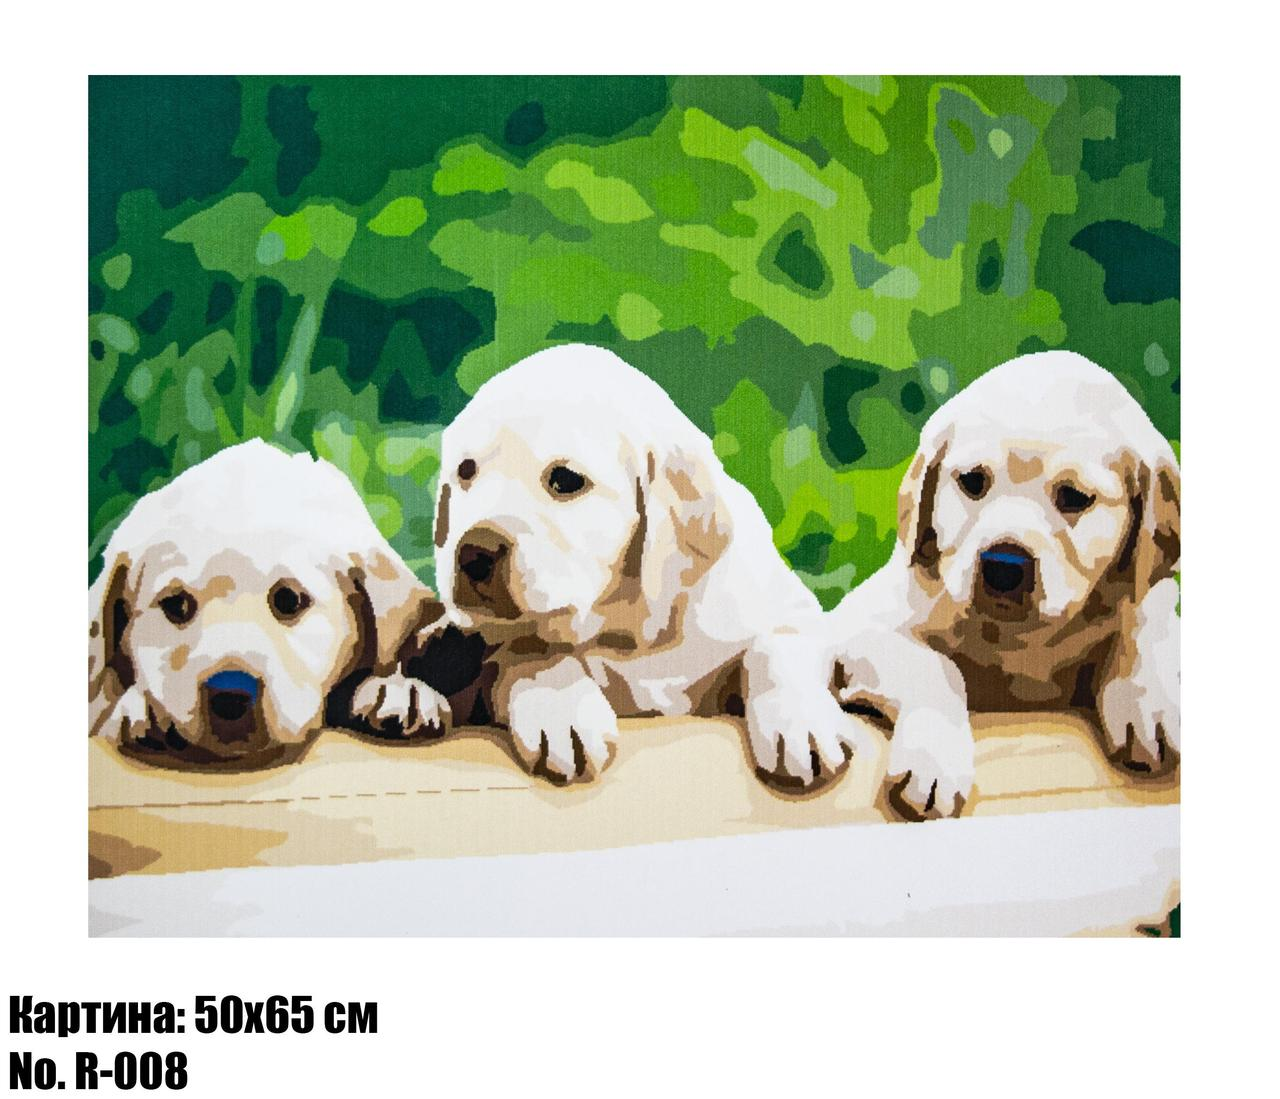 "Картина по номерам ""Маленький Лабрадоры"" размер 50 х 65 см, код R-008"